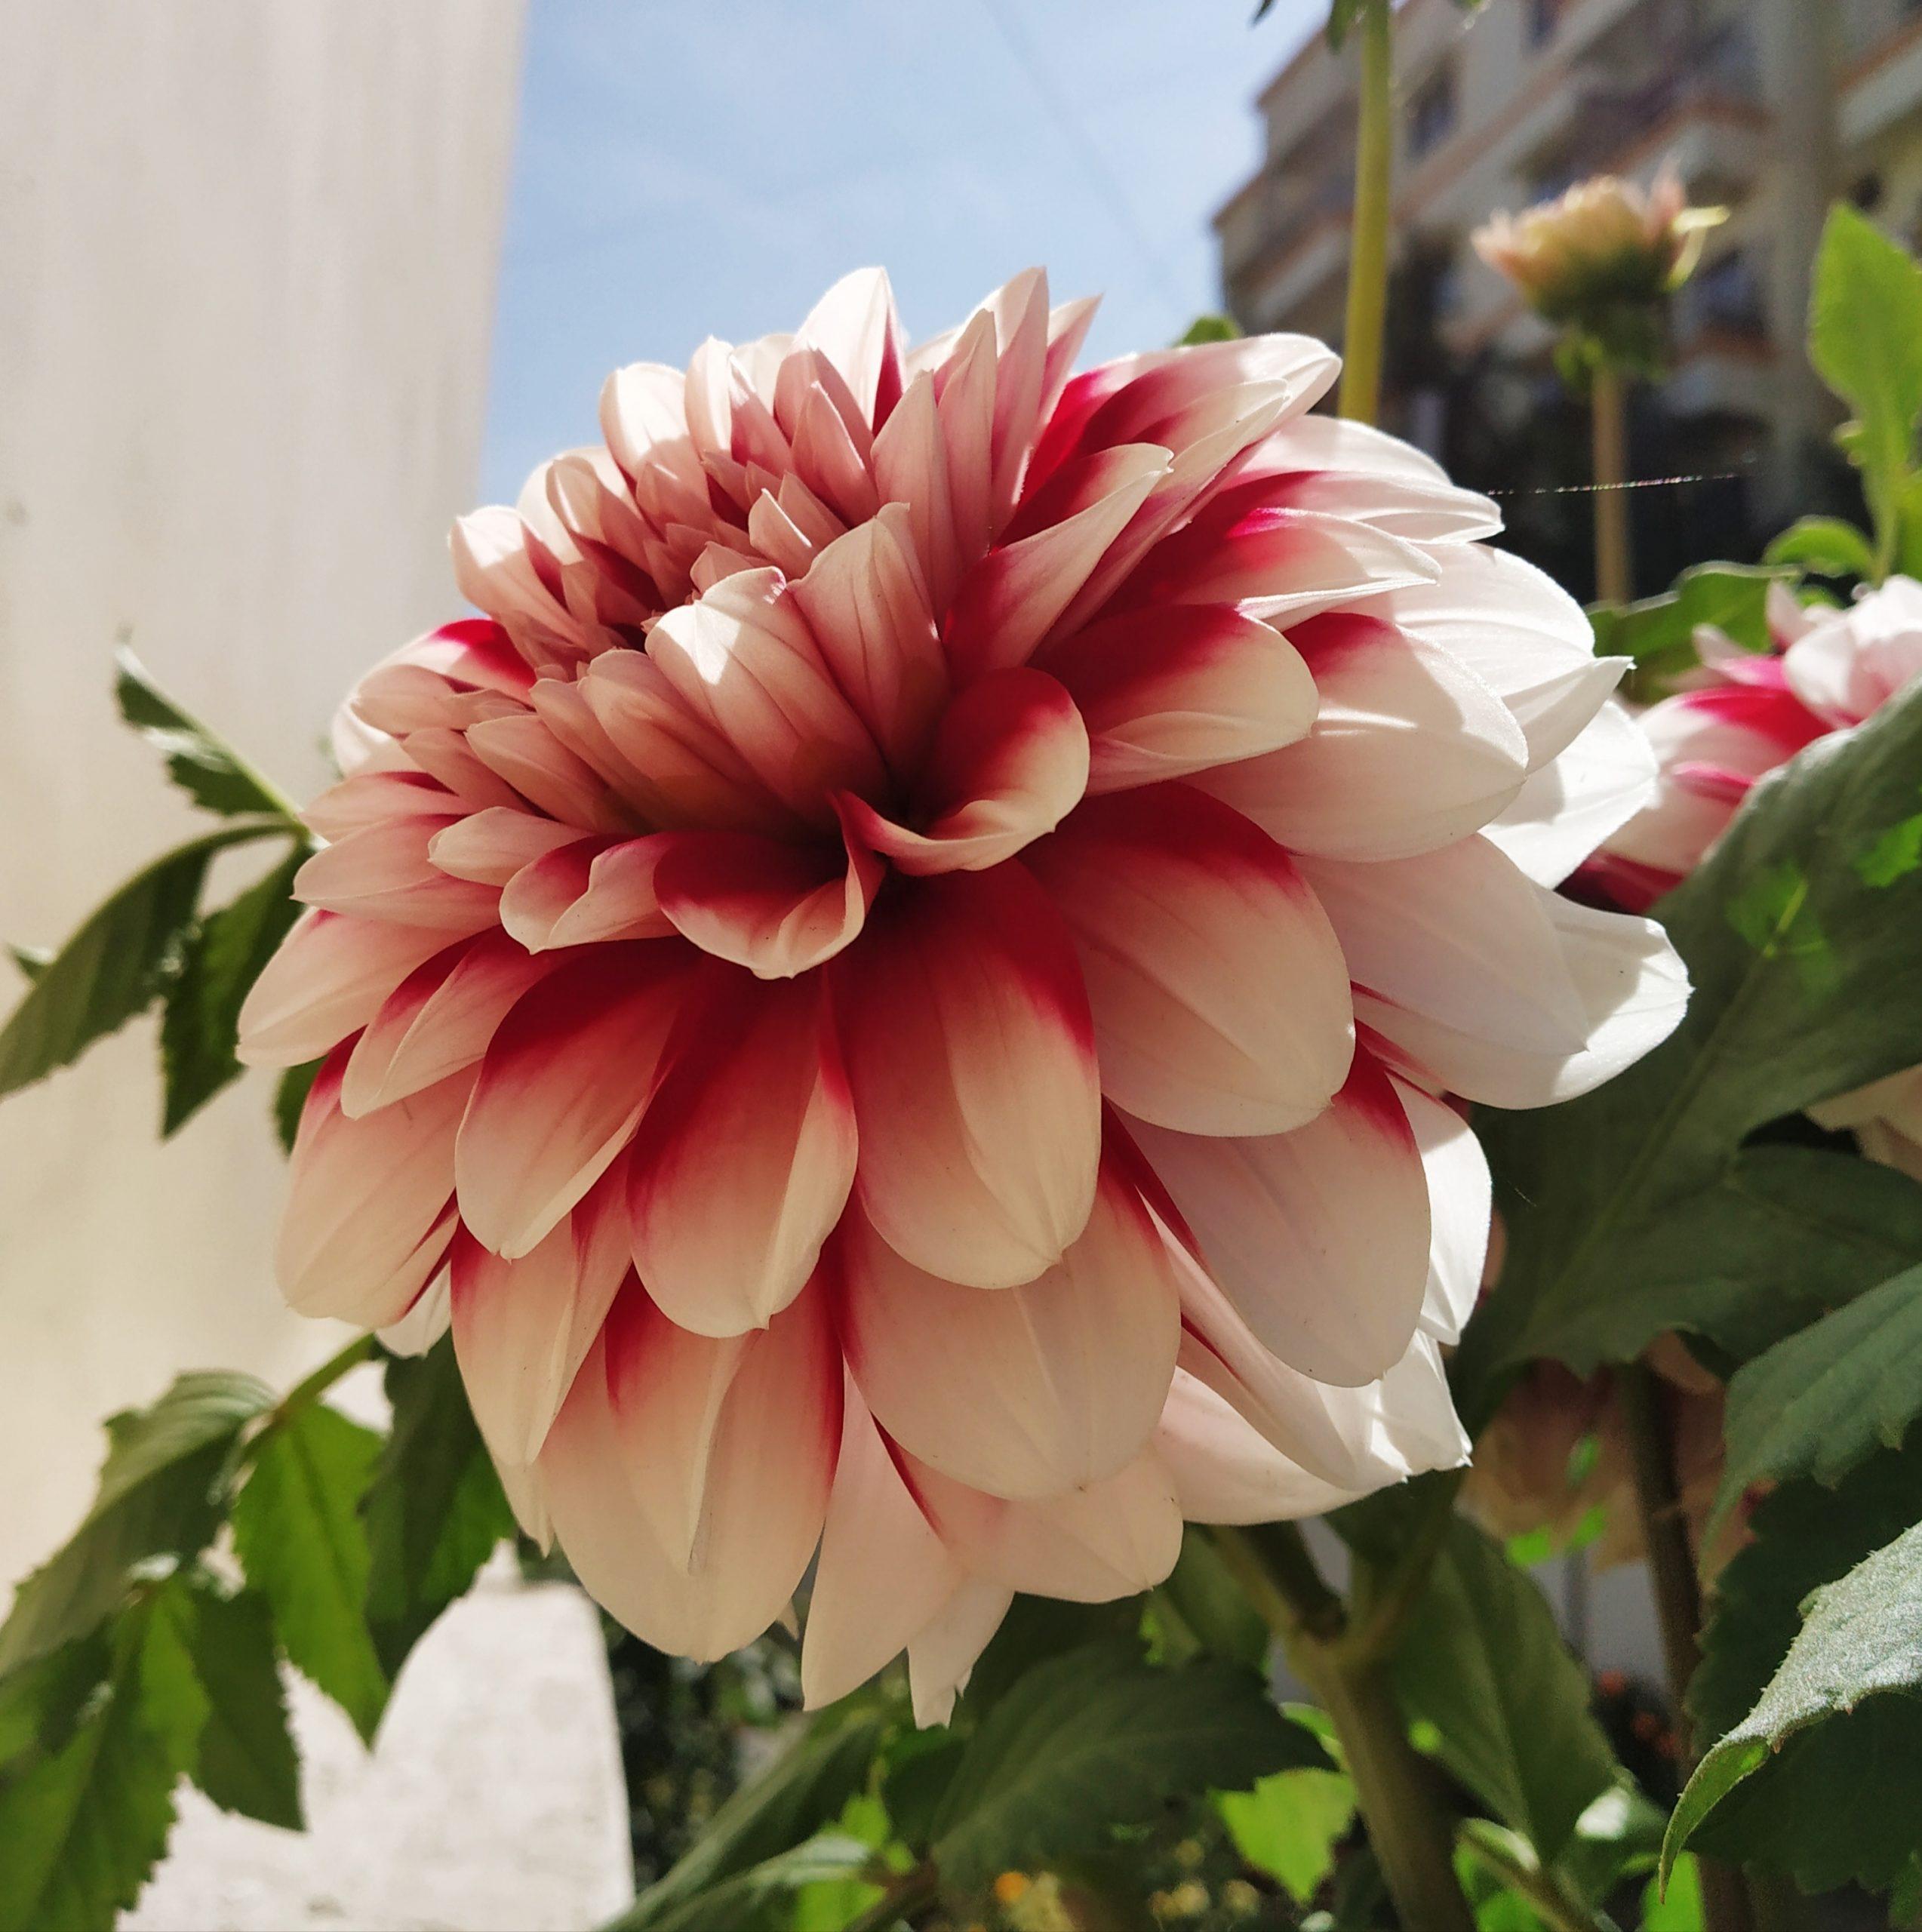 Shaded flower